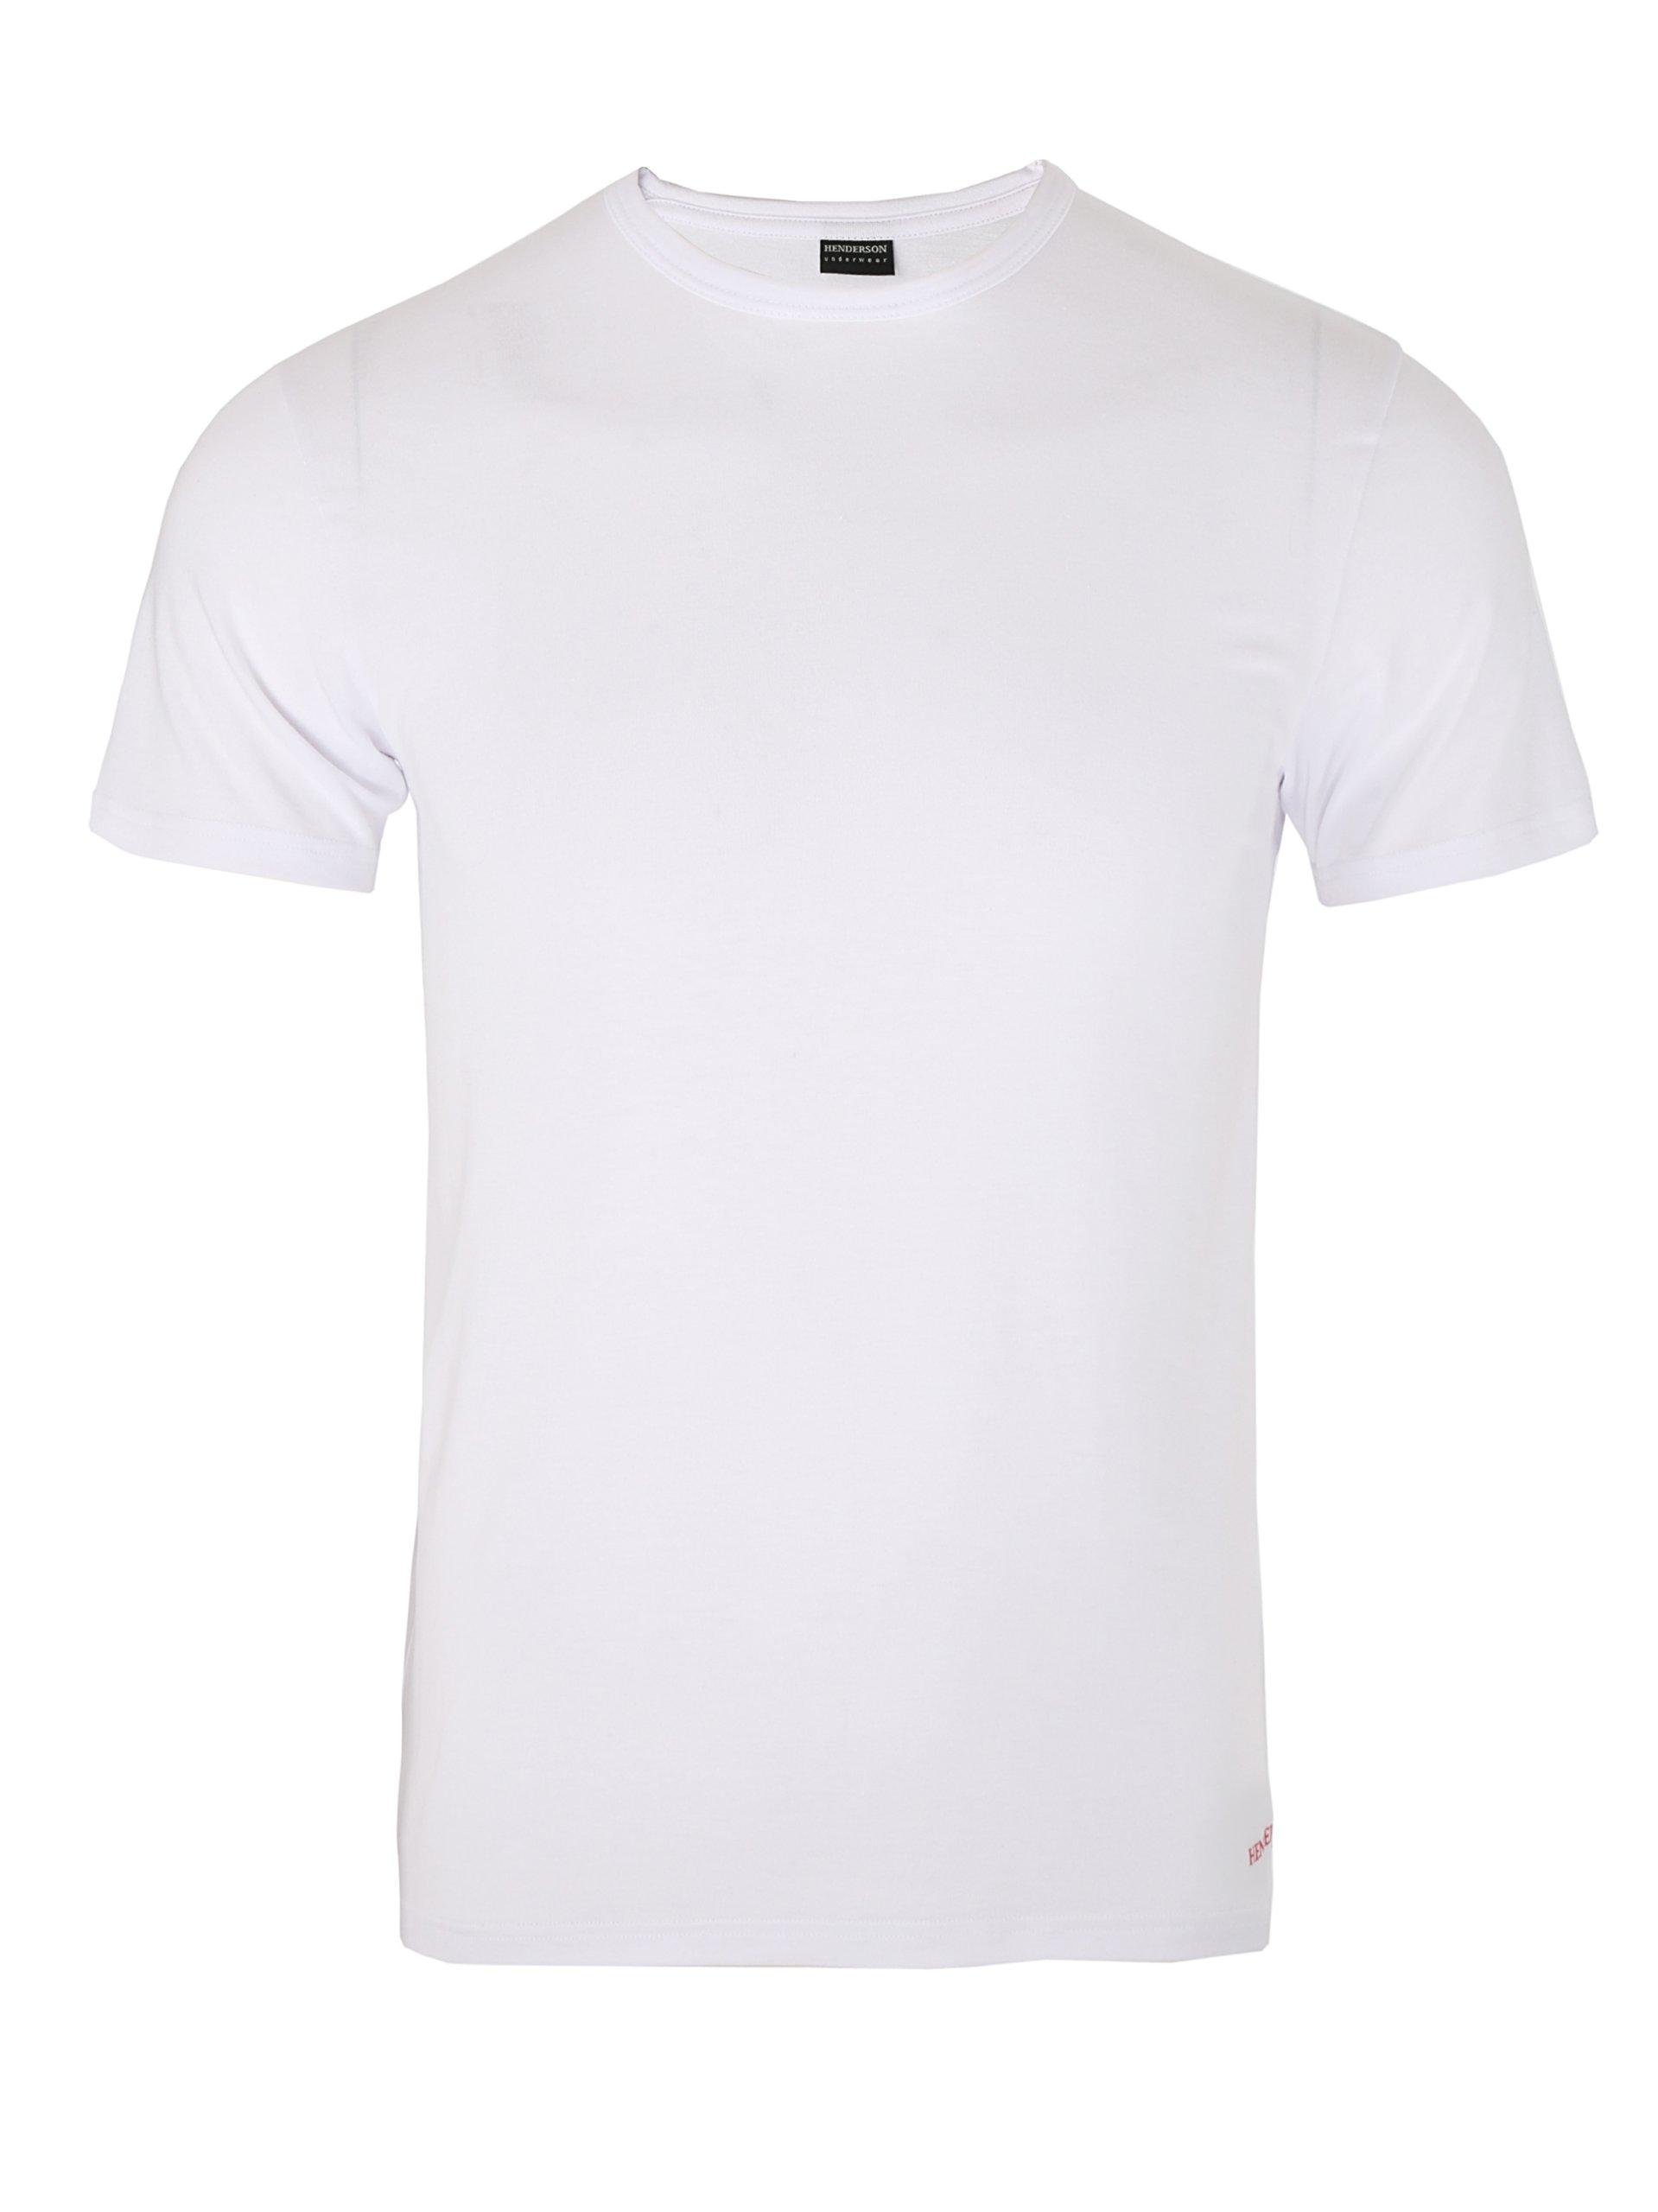 Podkoszulek Henderson Koszulka BIAŁA Bawełna XL